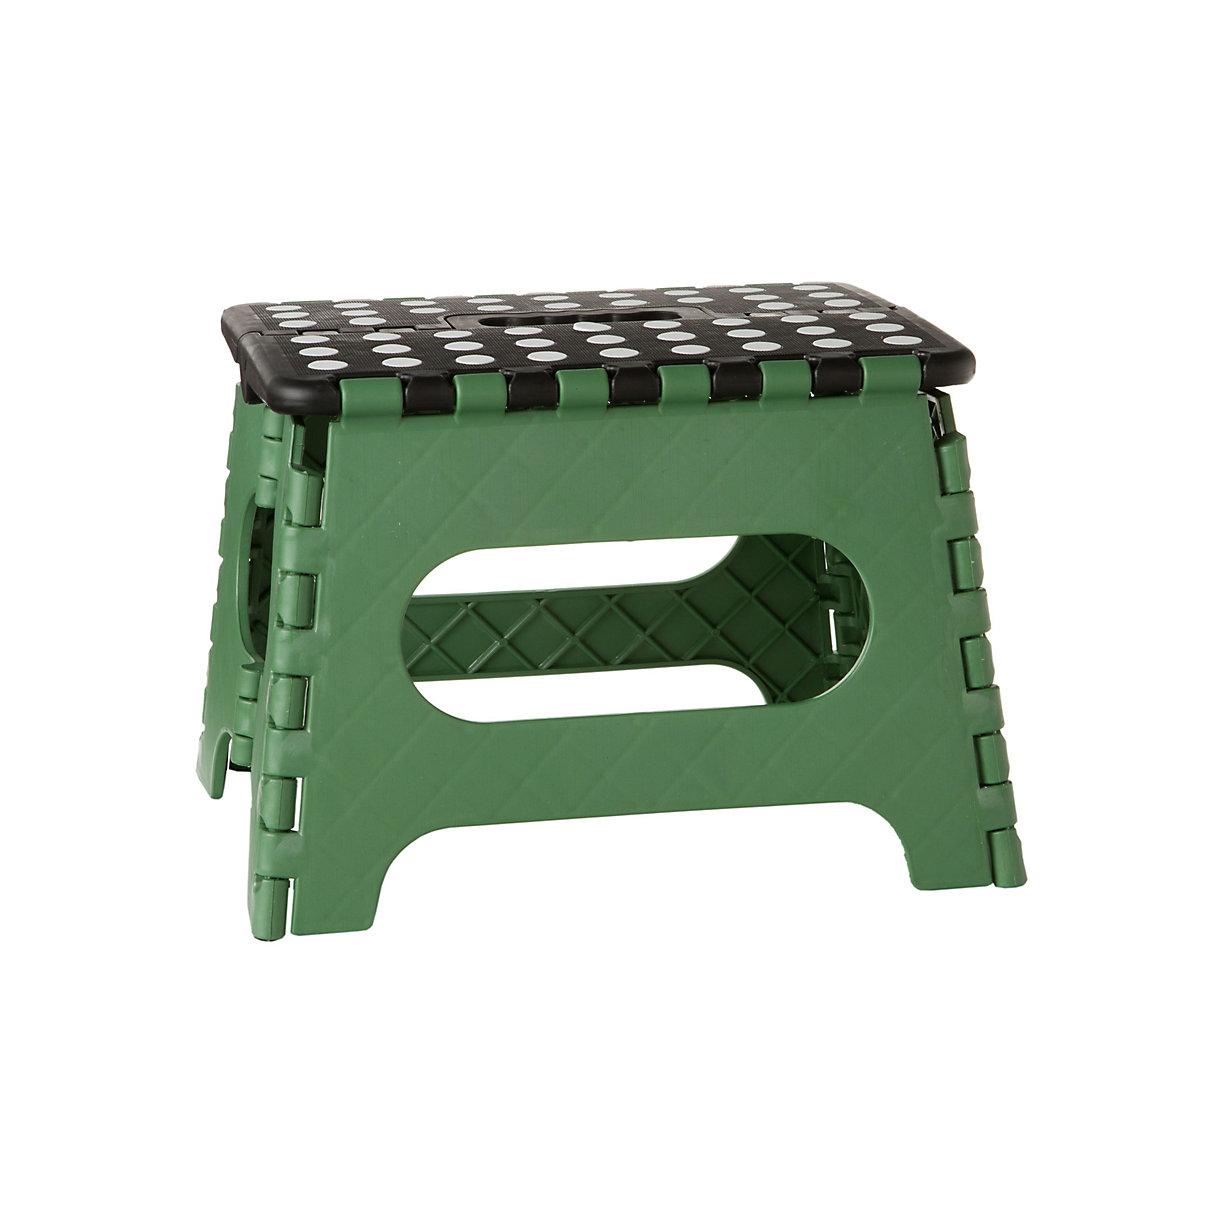 folding step stool terrain. Black Bedroom Furniture Sets. Home Design Ideas